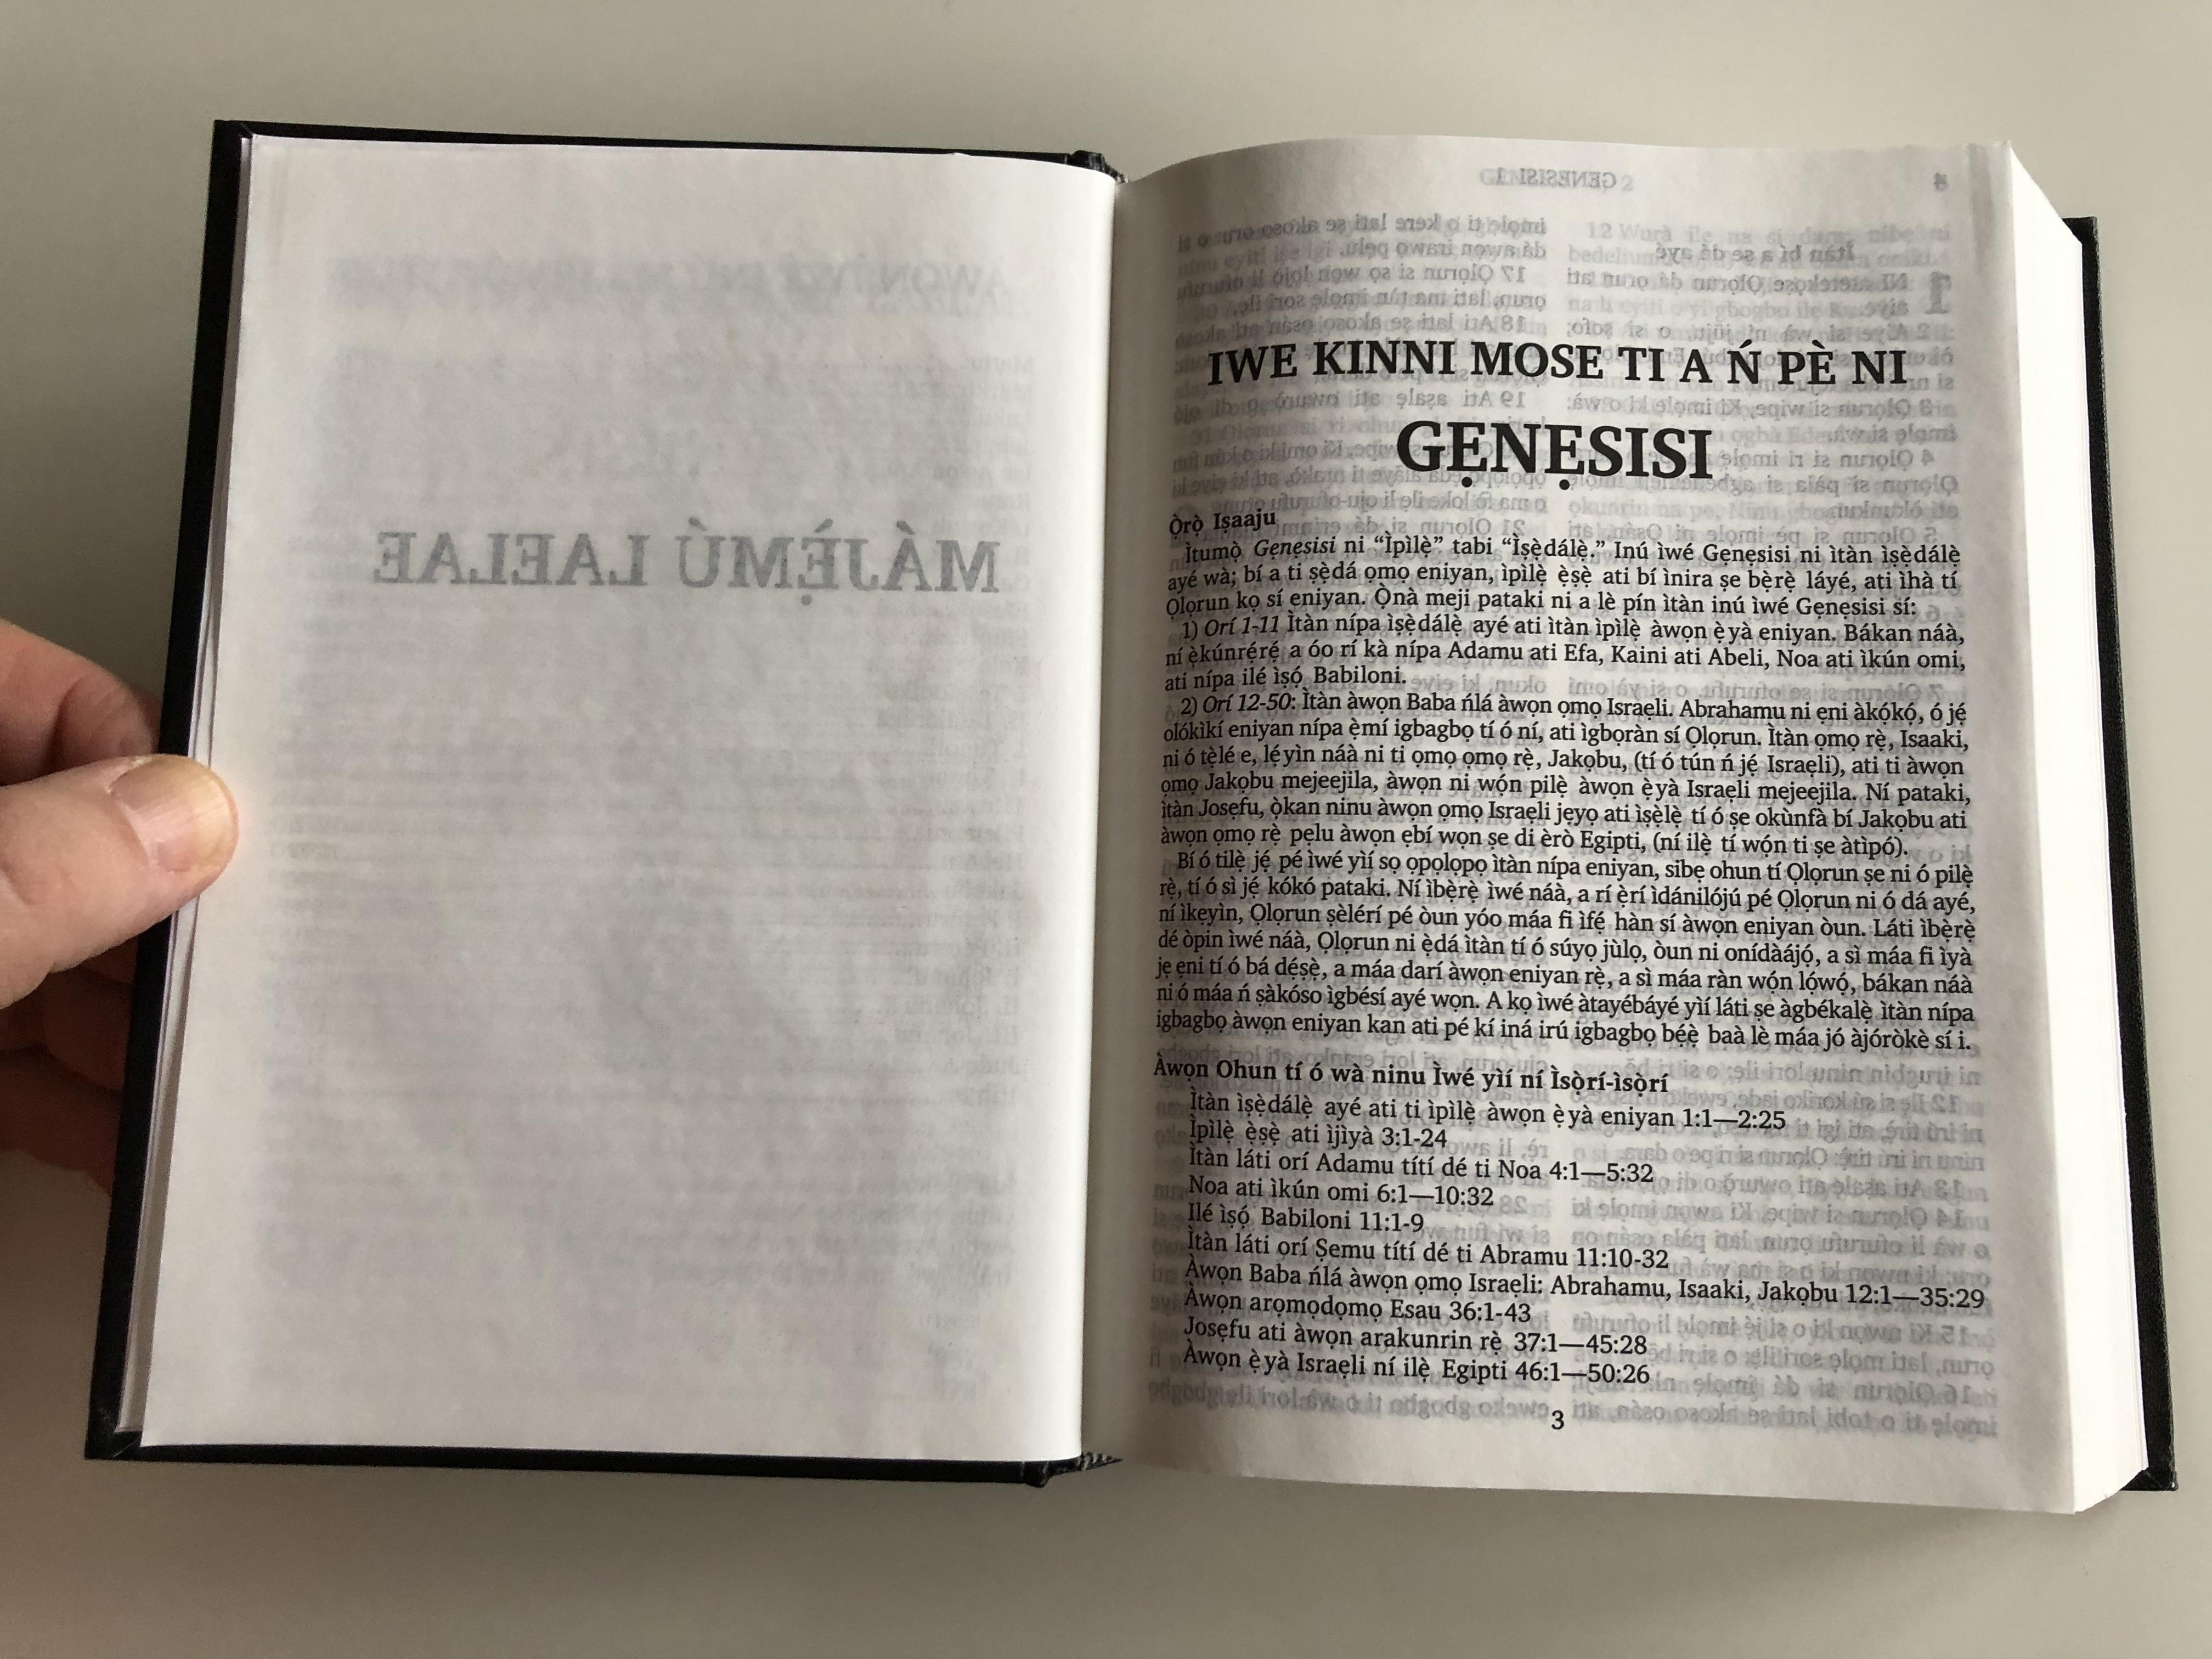 bibeli-mimo-al-kol-yoruba-language-holy-bible-7.jpg